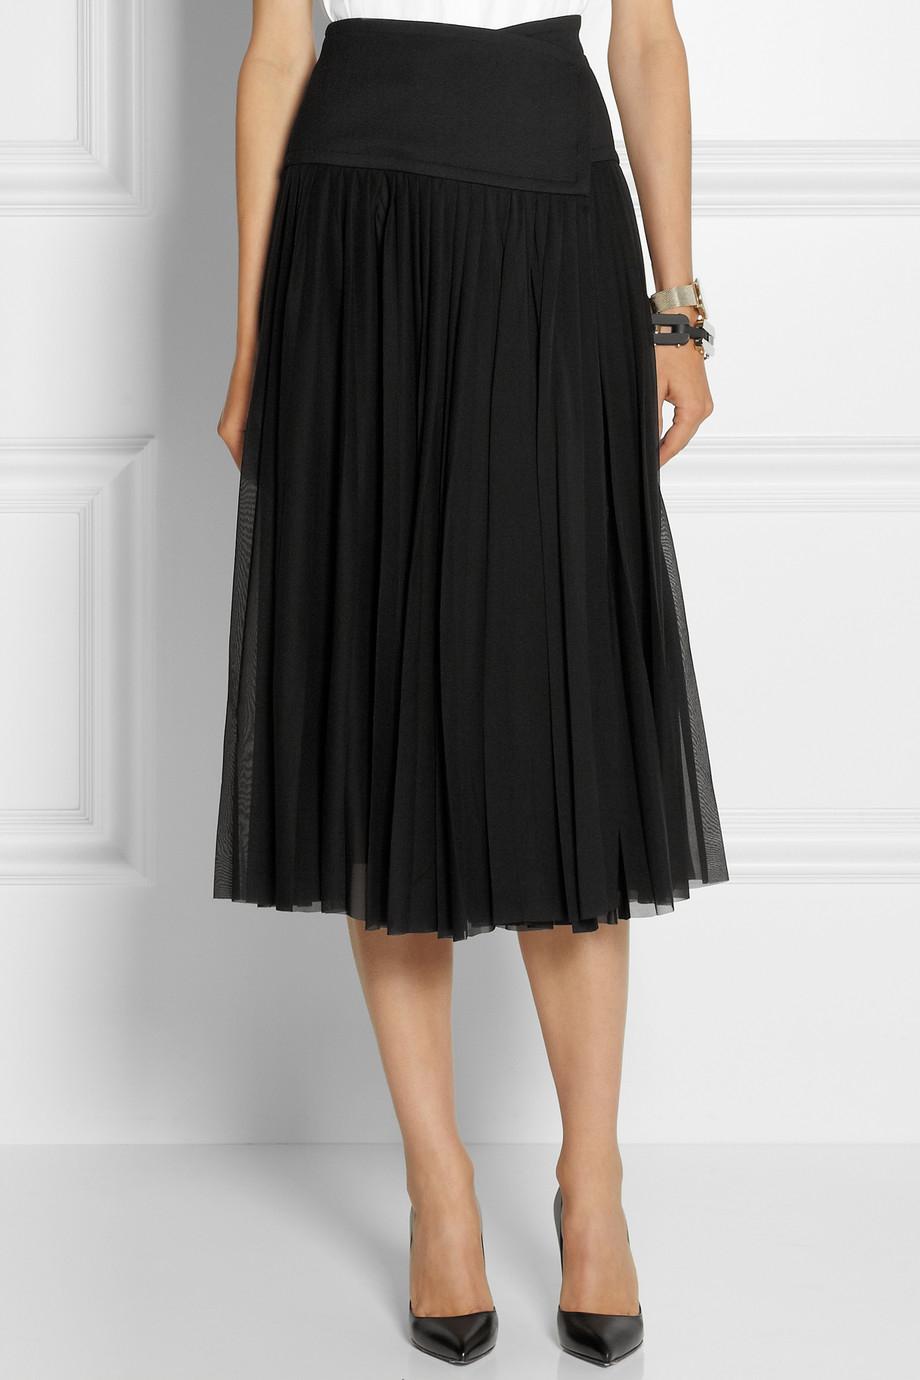 Lyst Donna Karan Pleated Stretch Silk Georgette Wrap Skirt In Black